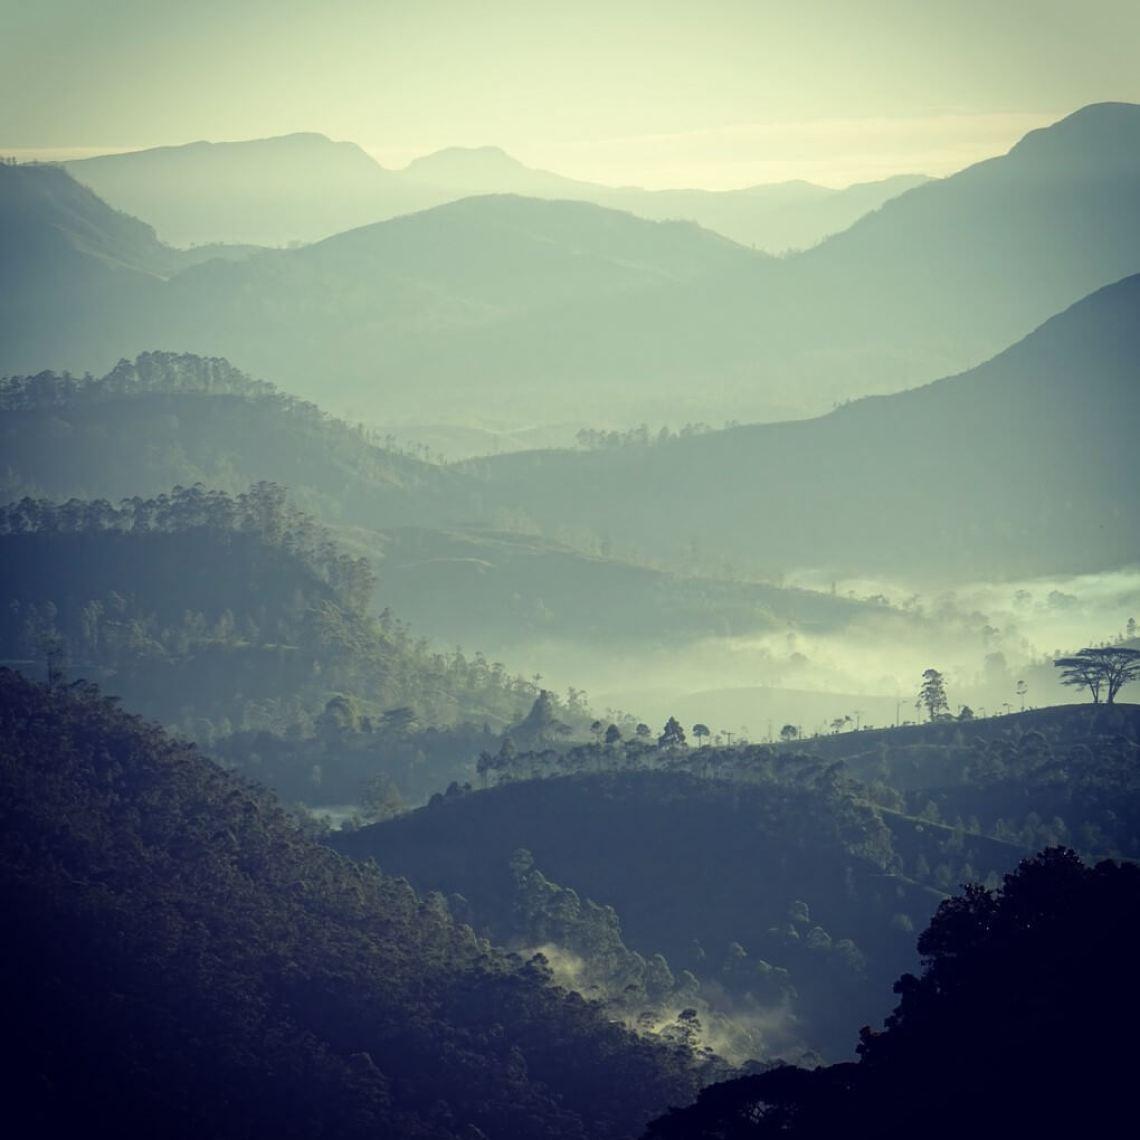 View from Adam's Peak at dawn